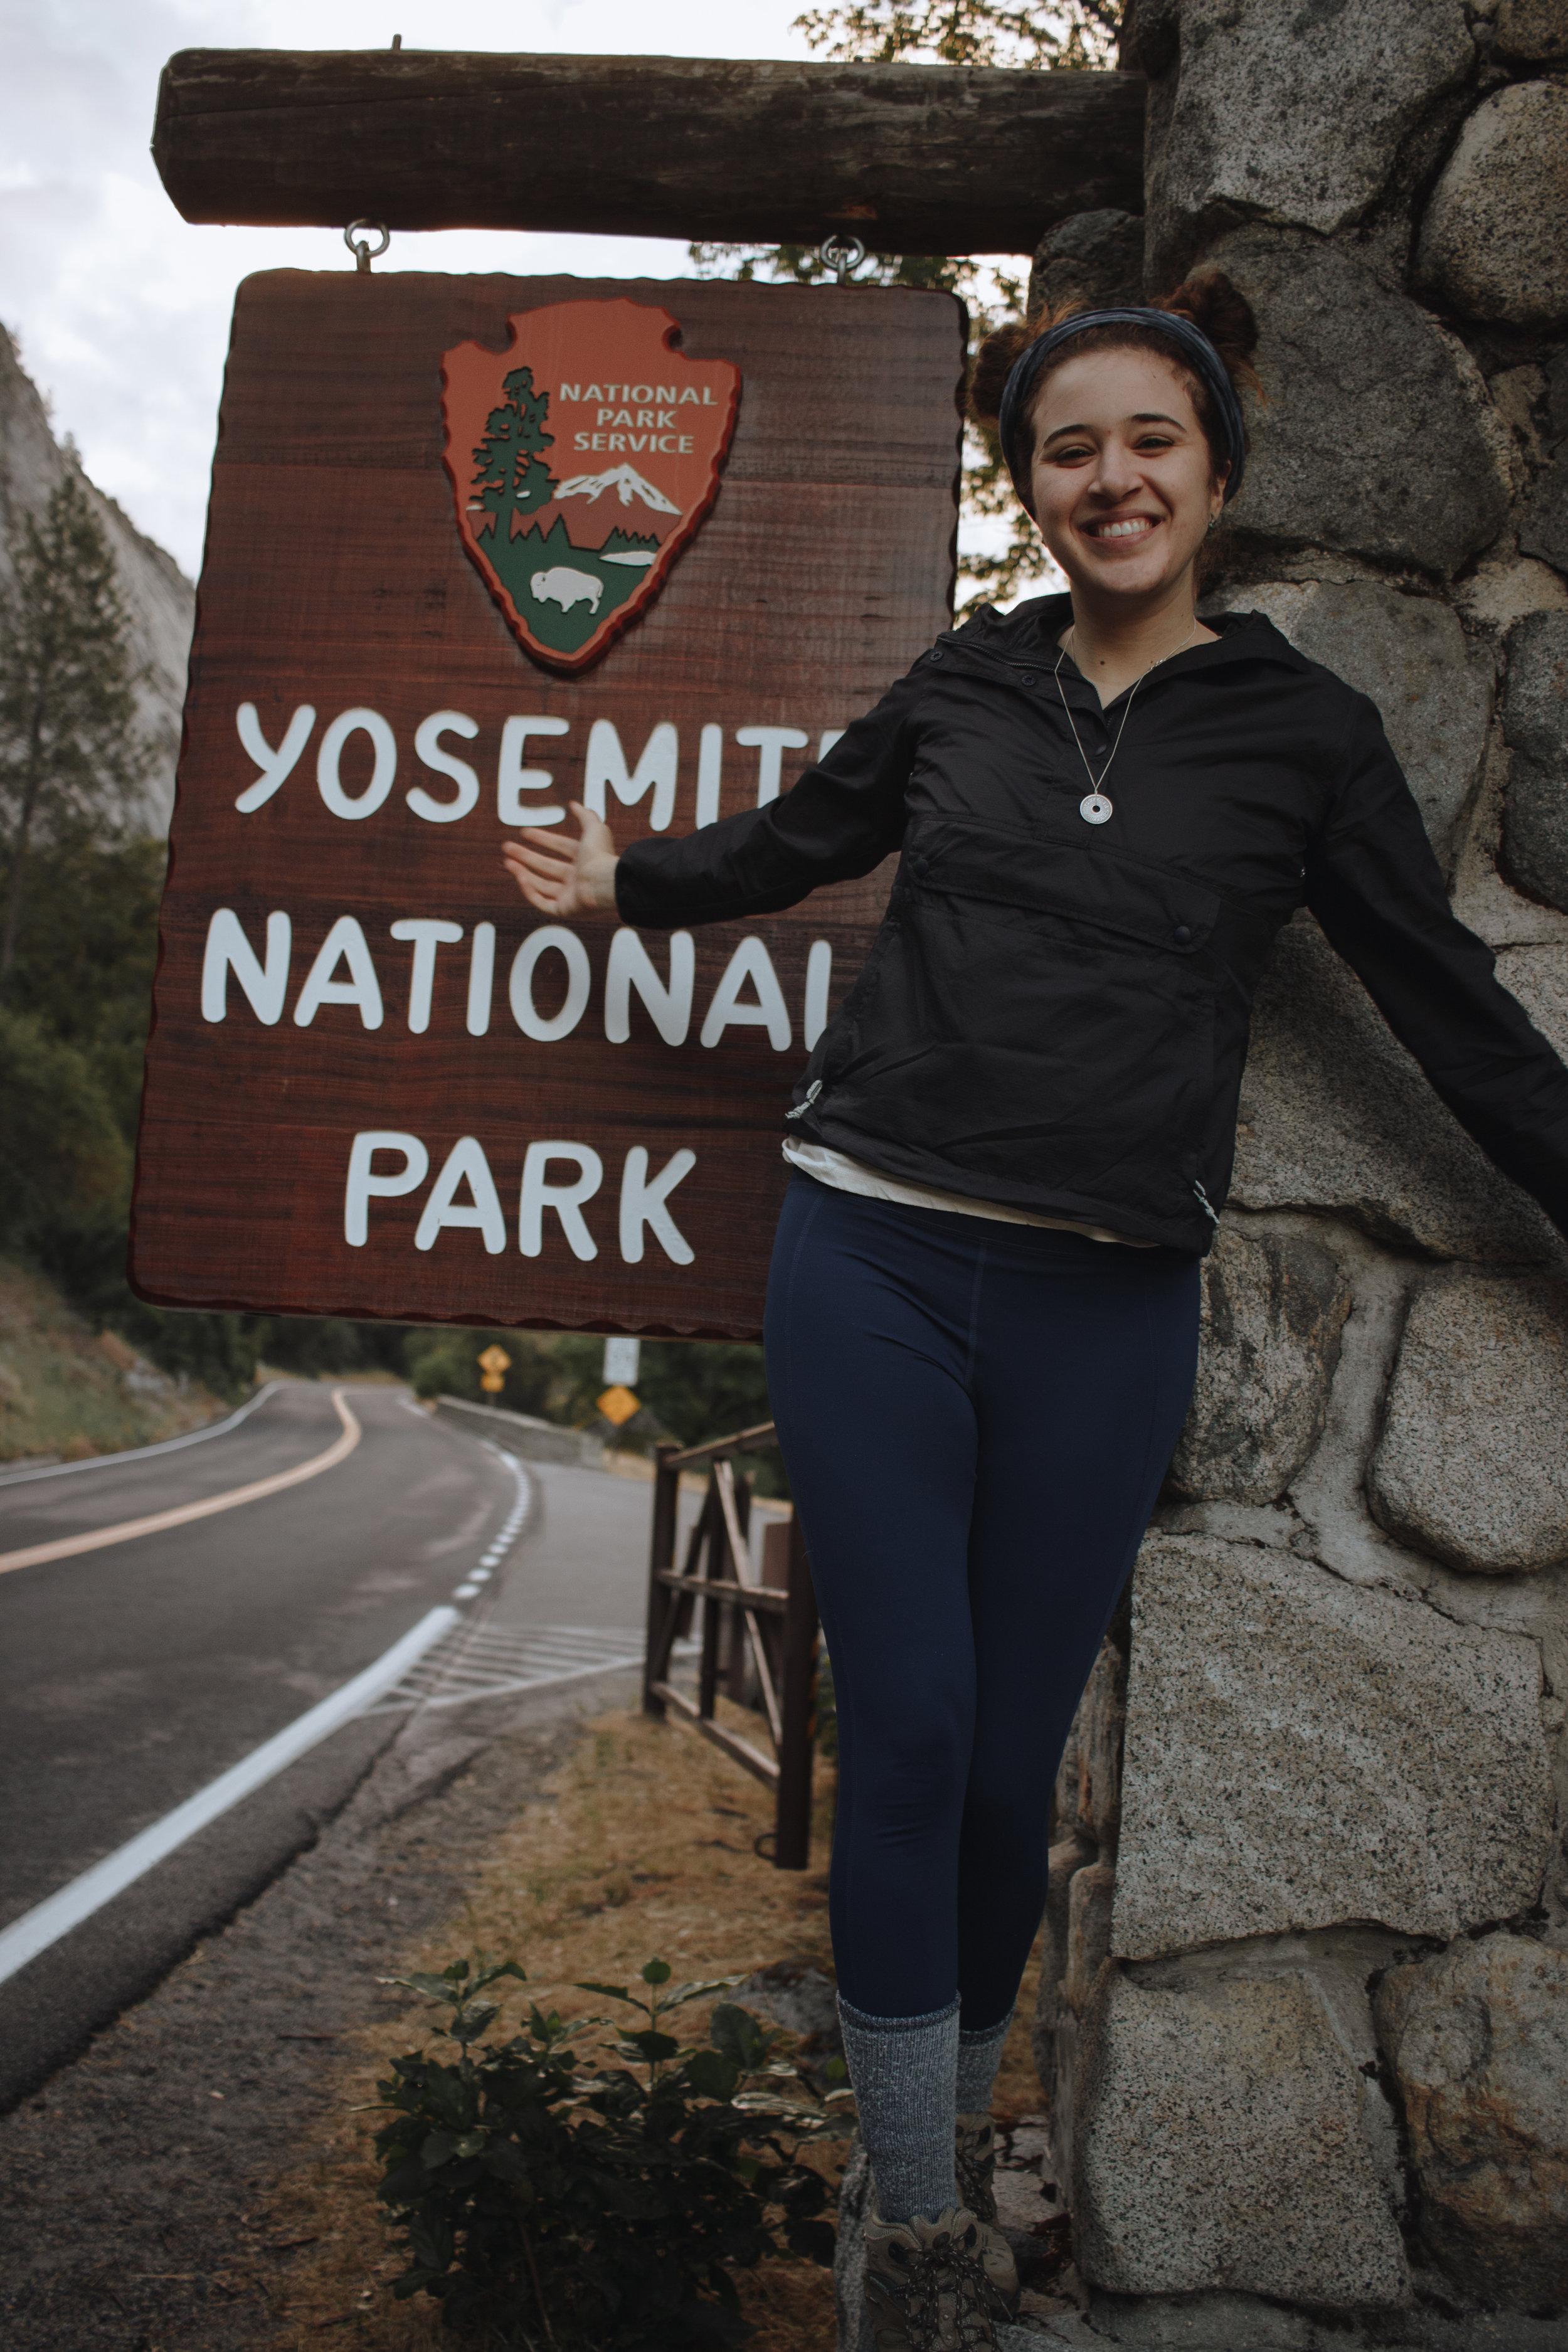 The entrance to Yosemite